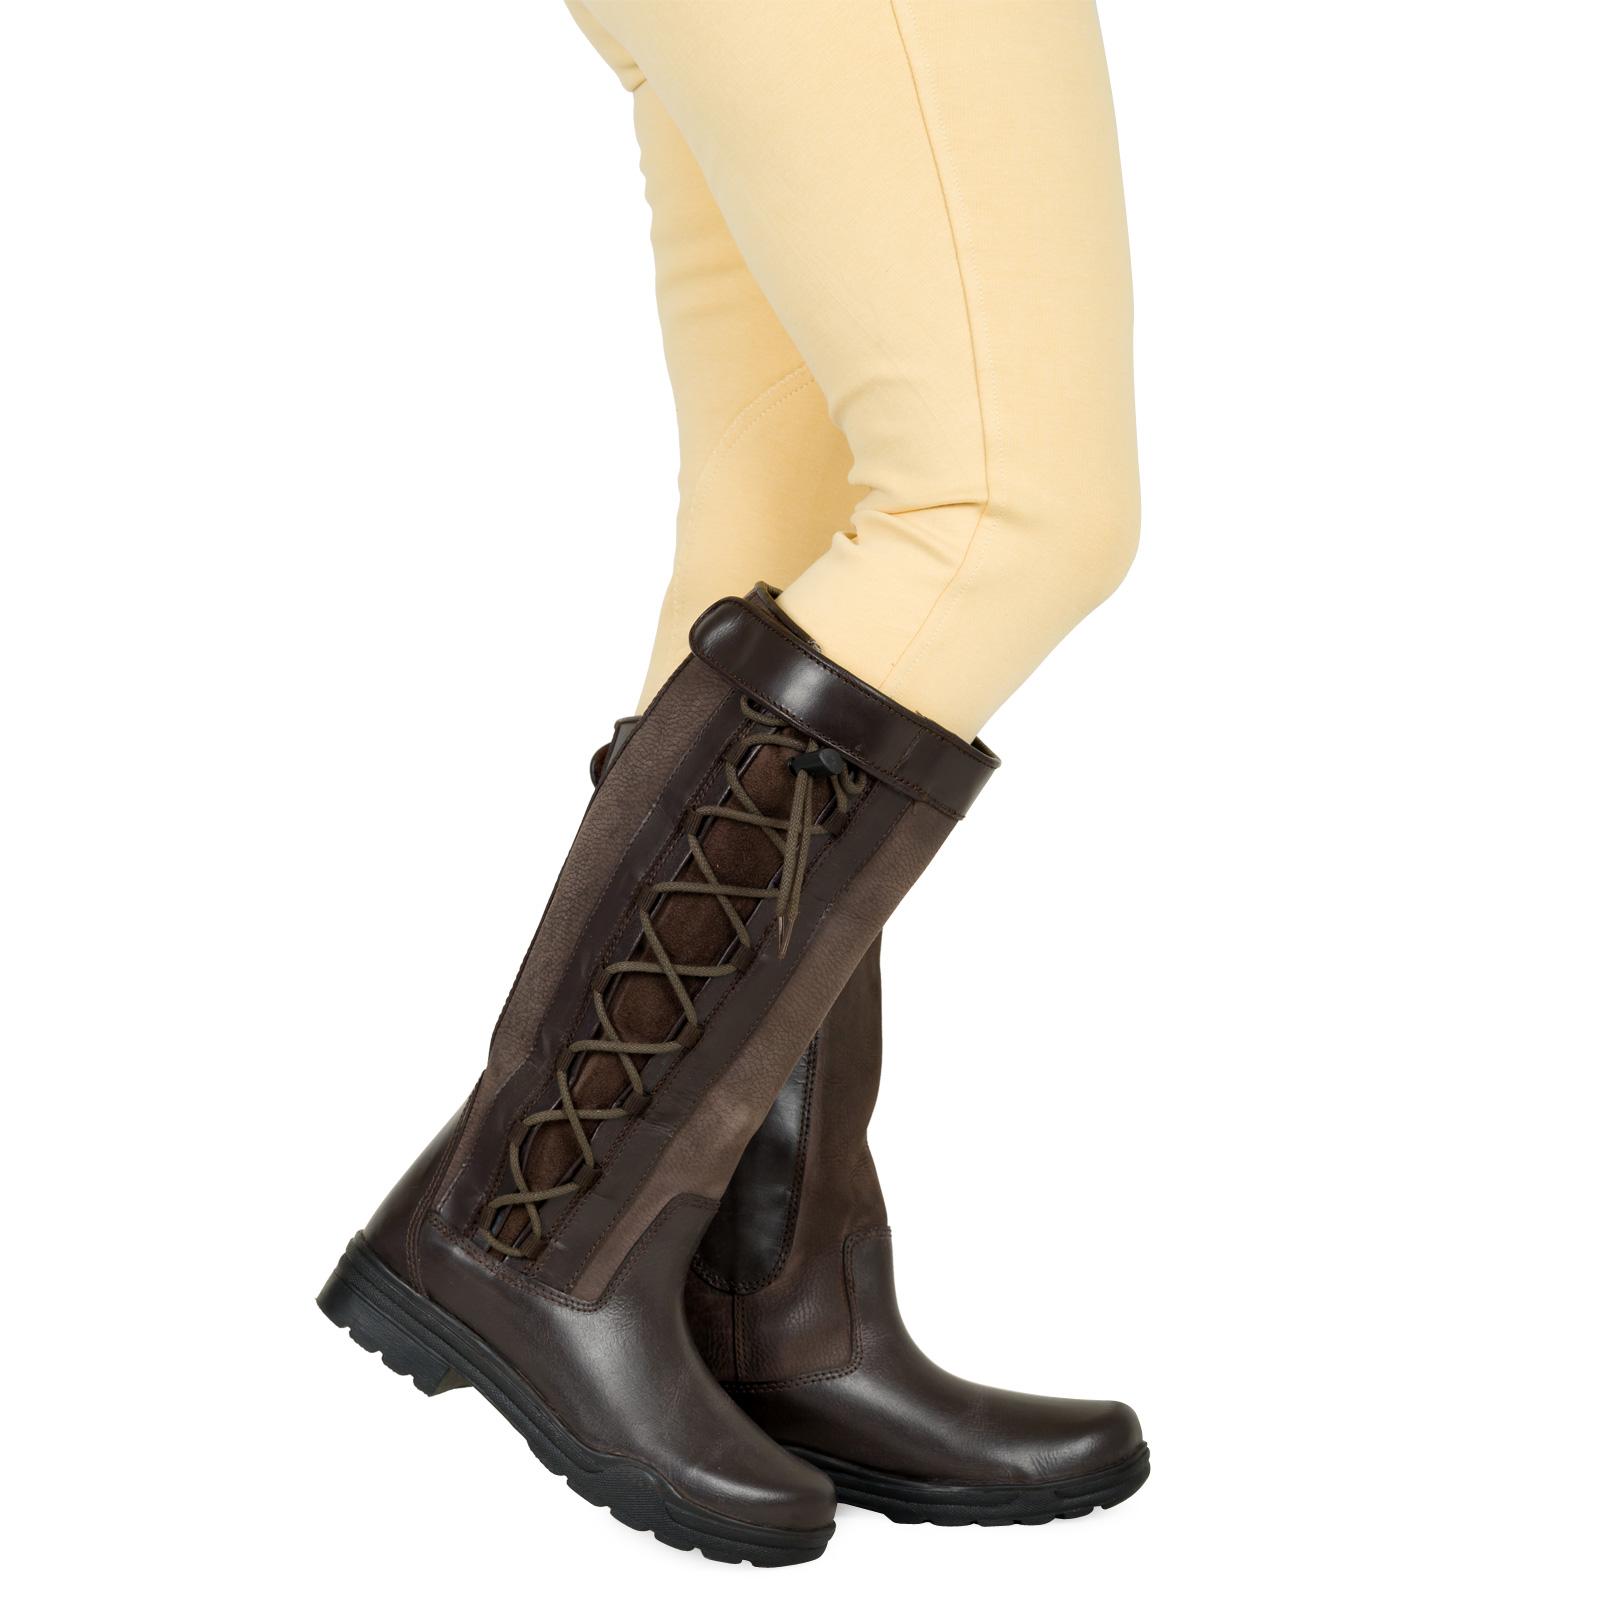 Womens Waterproof Winter Horse Riding Walking Leather